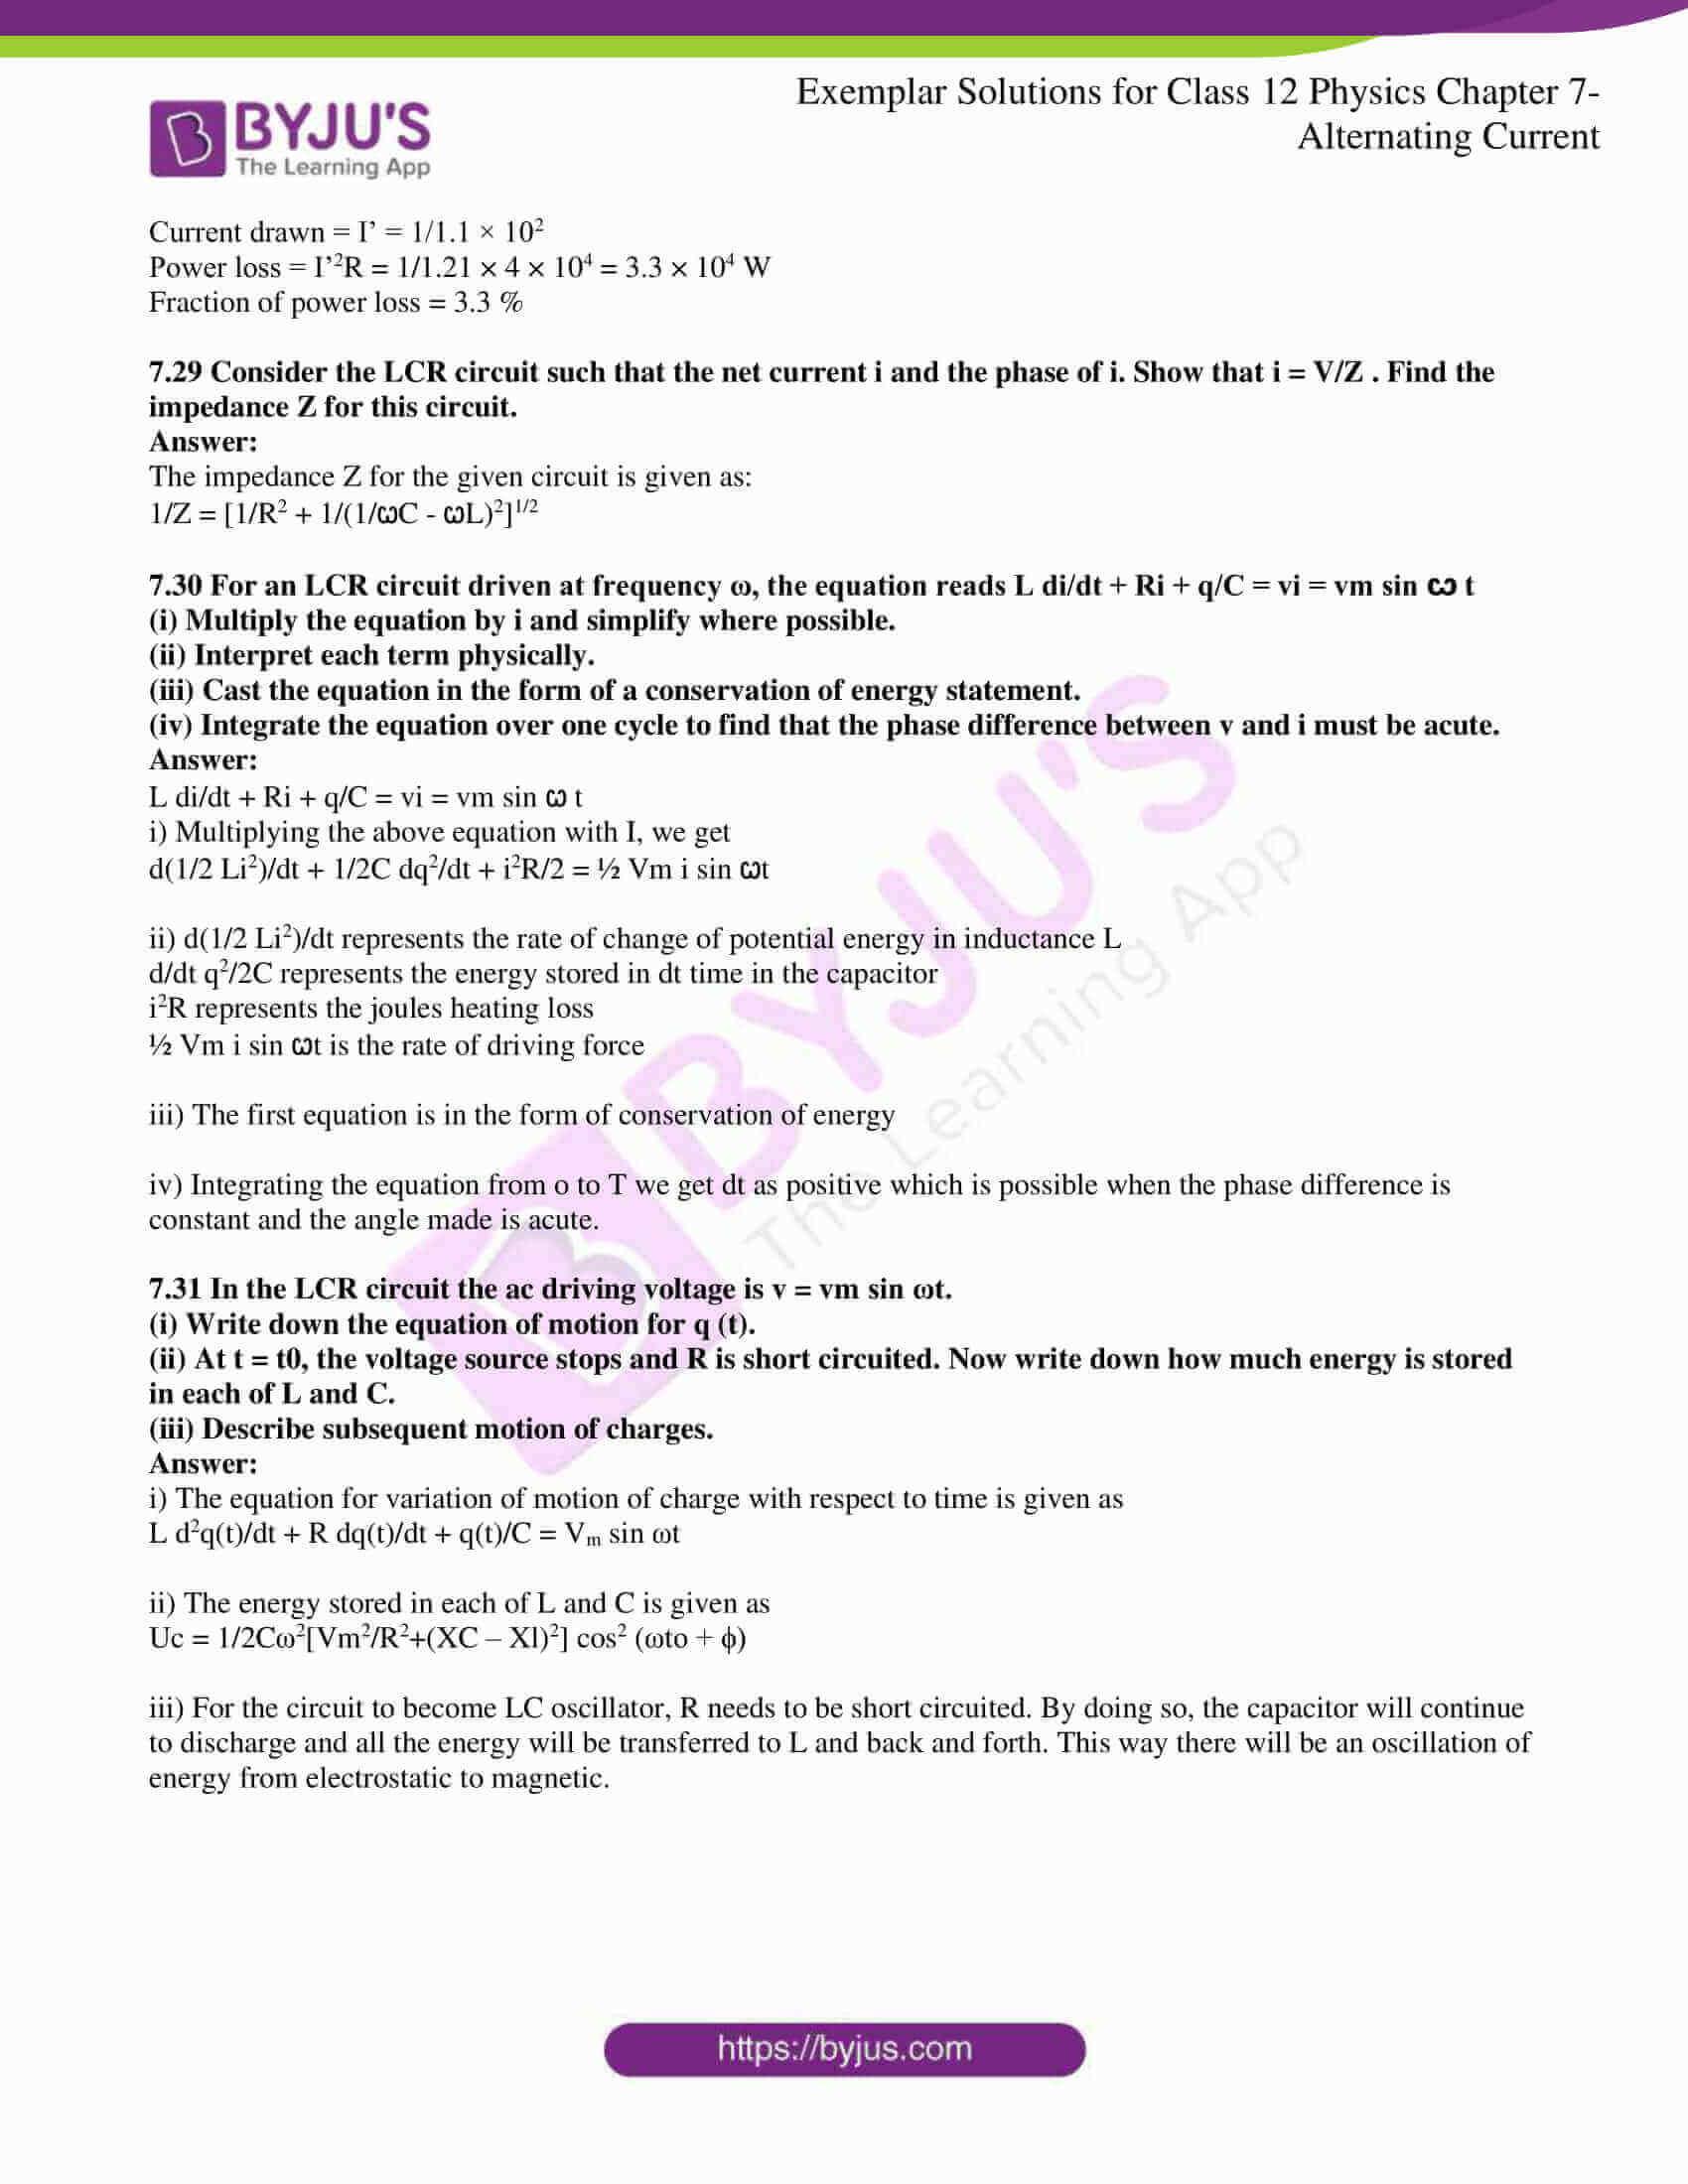 ncert exemplar solutions for class 12 physics chapter 7 9